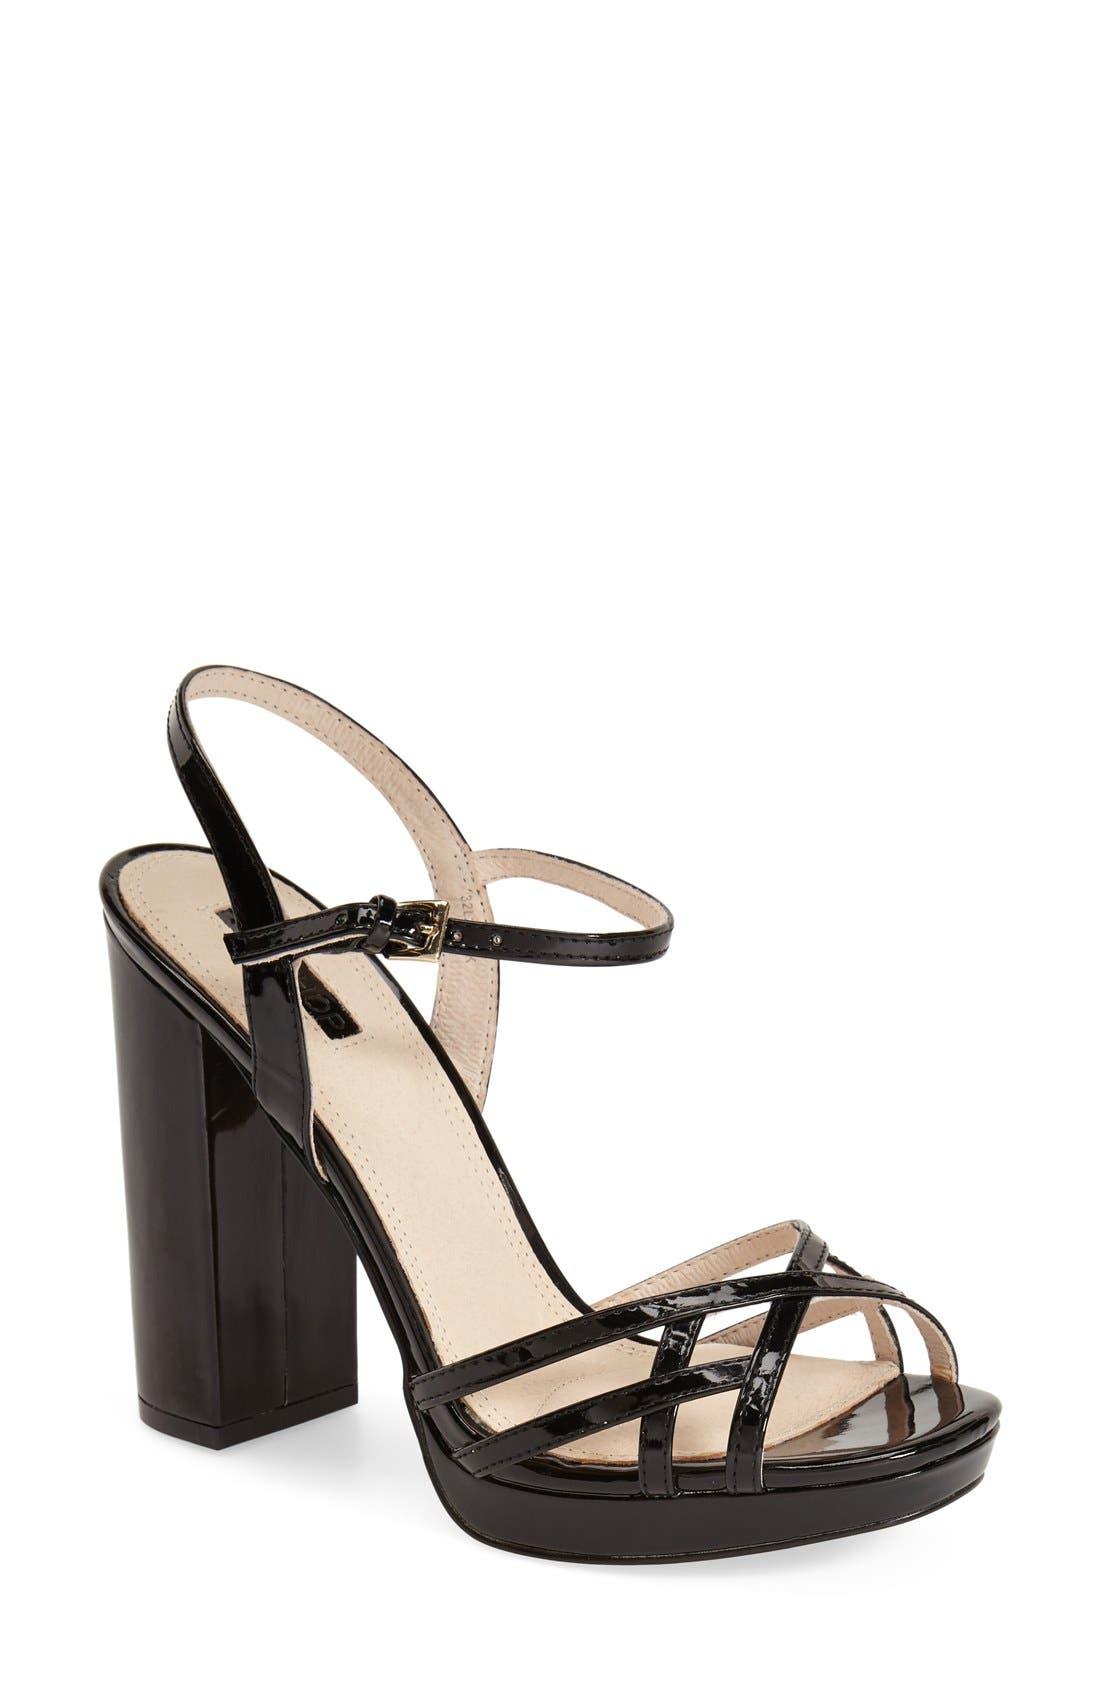 Main Image - Topshop 'Lola' Ankle Strap Platform Sandal (Women)